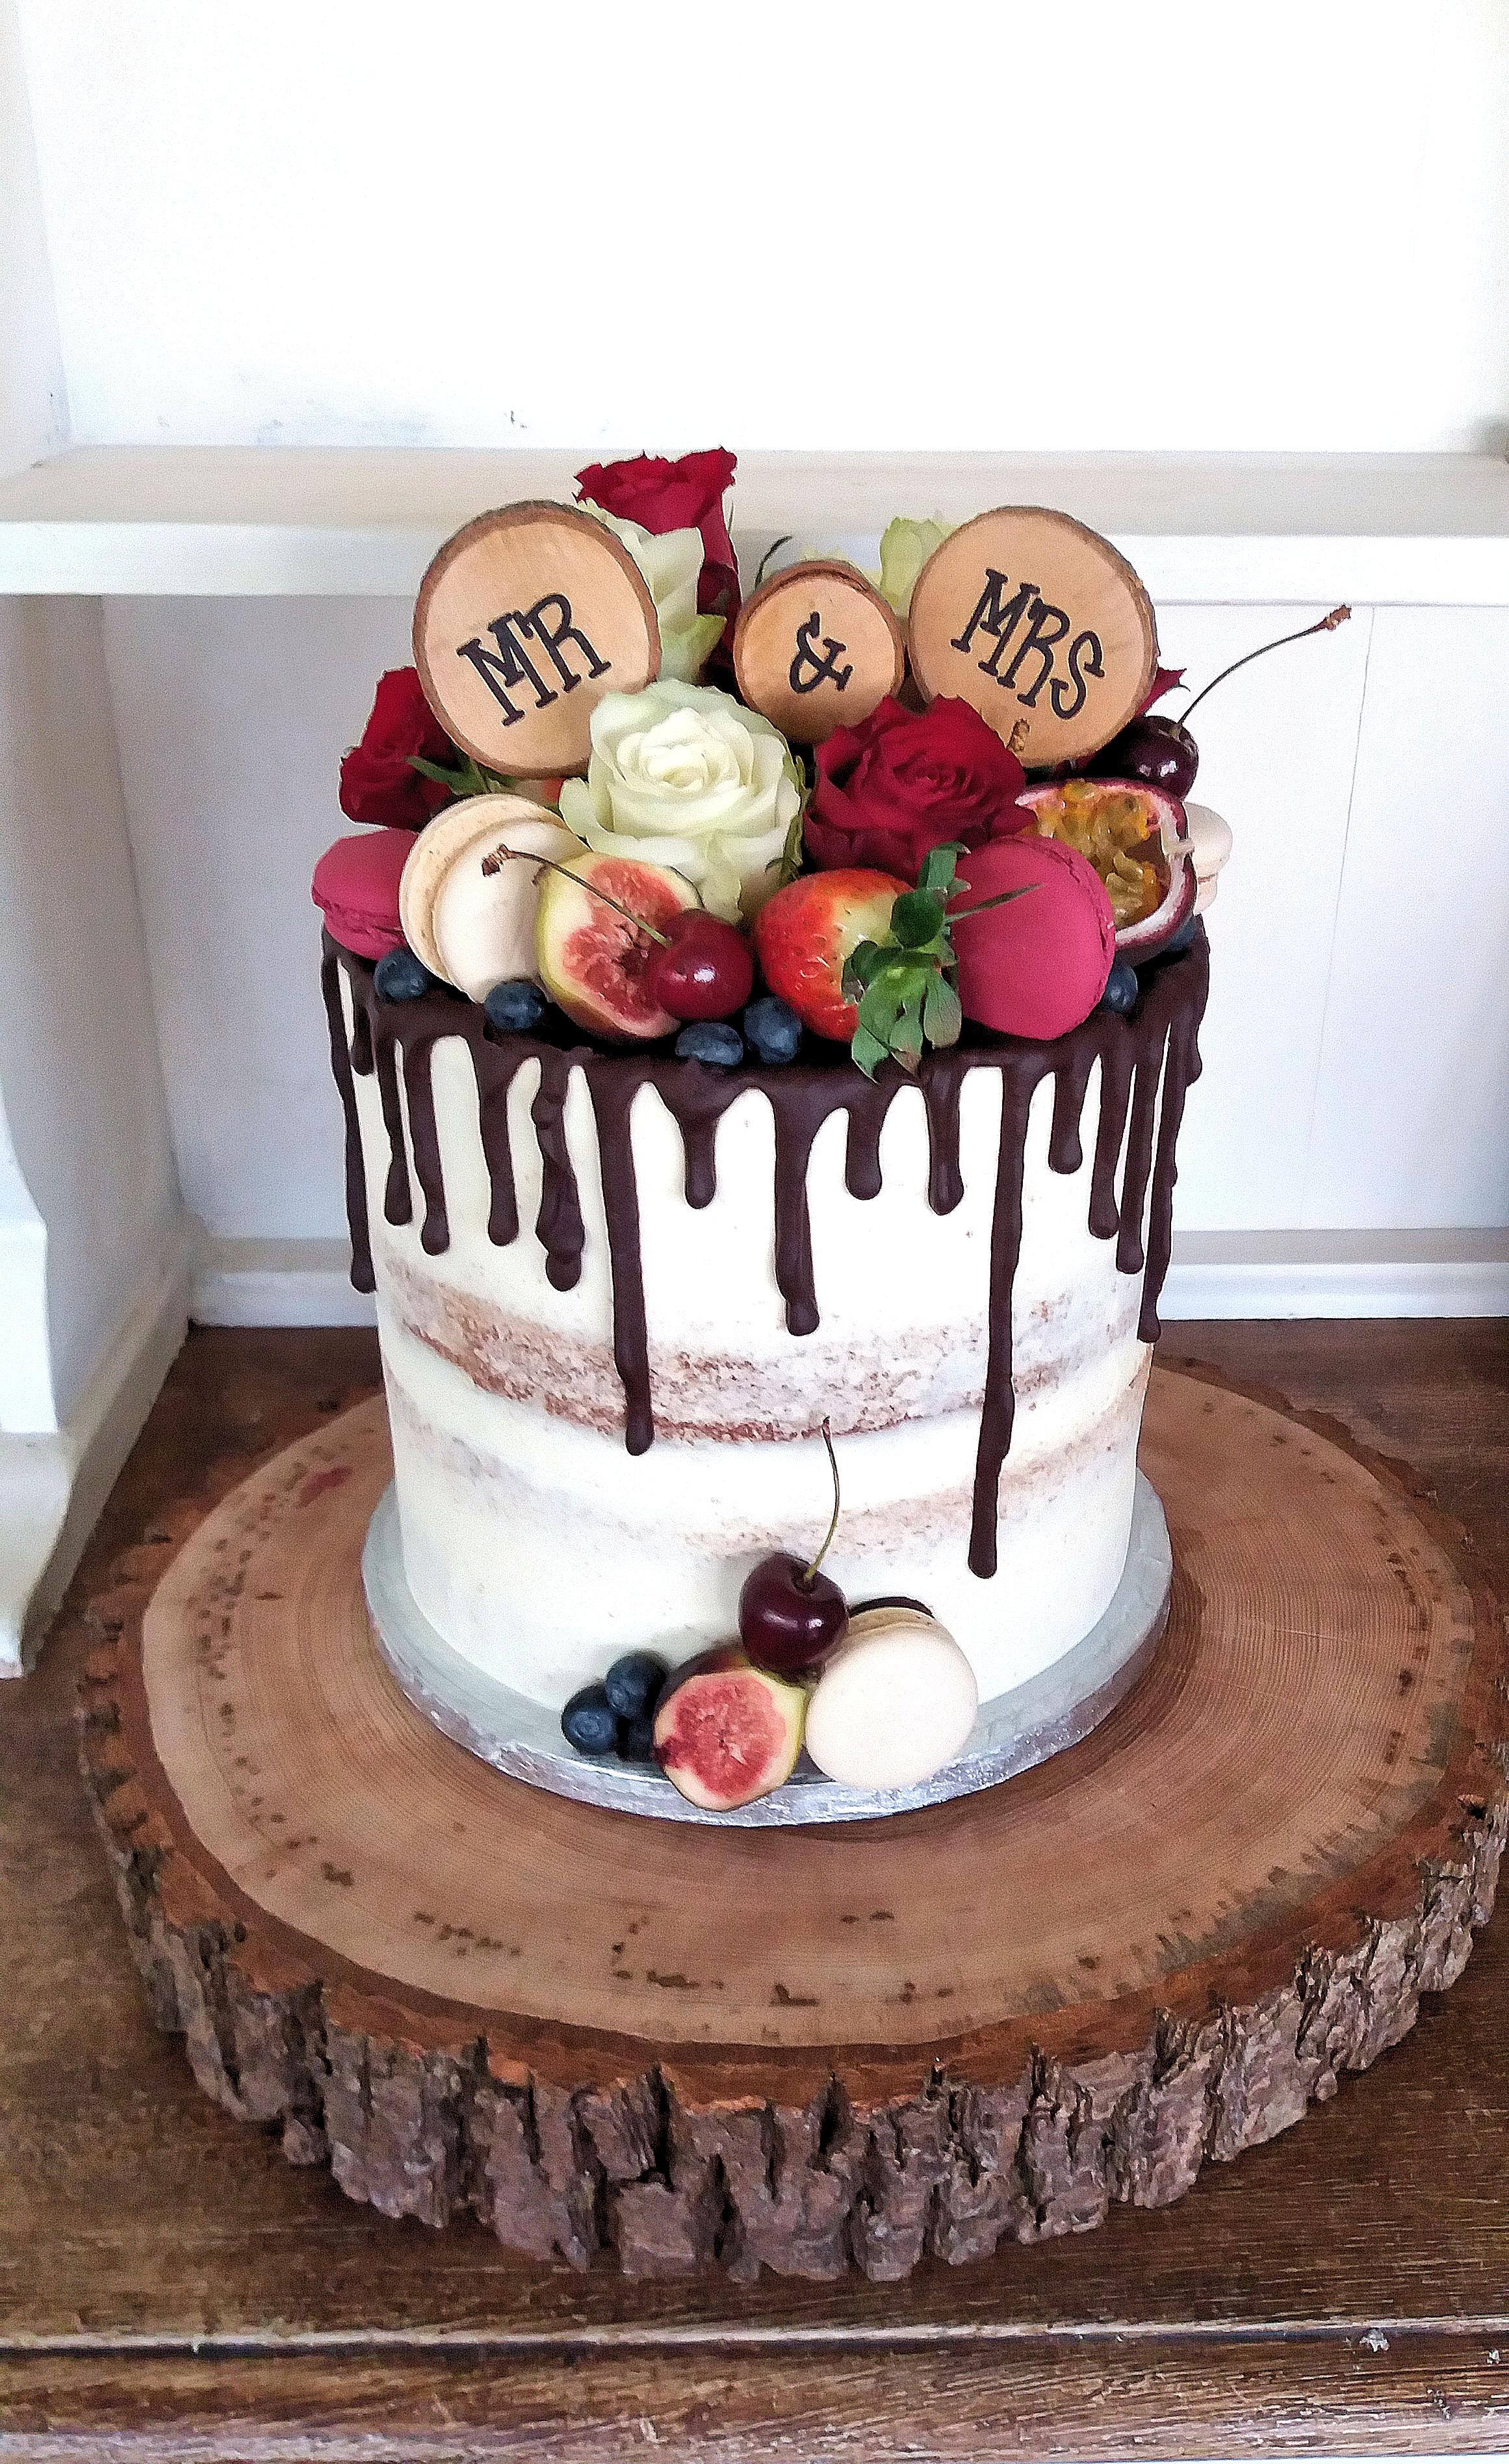 Semi Naked Wedding cake with fresh fruit and flowers.jpg